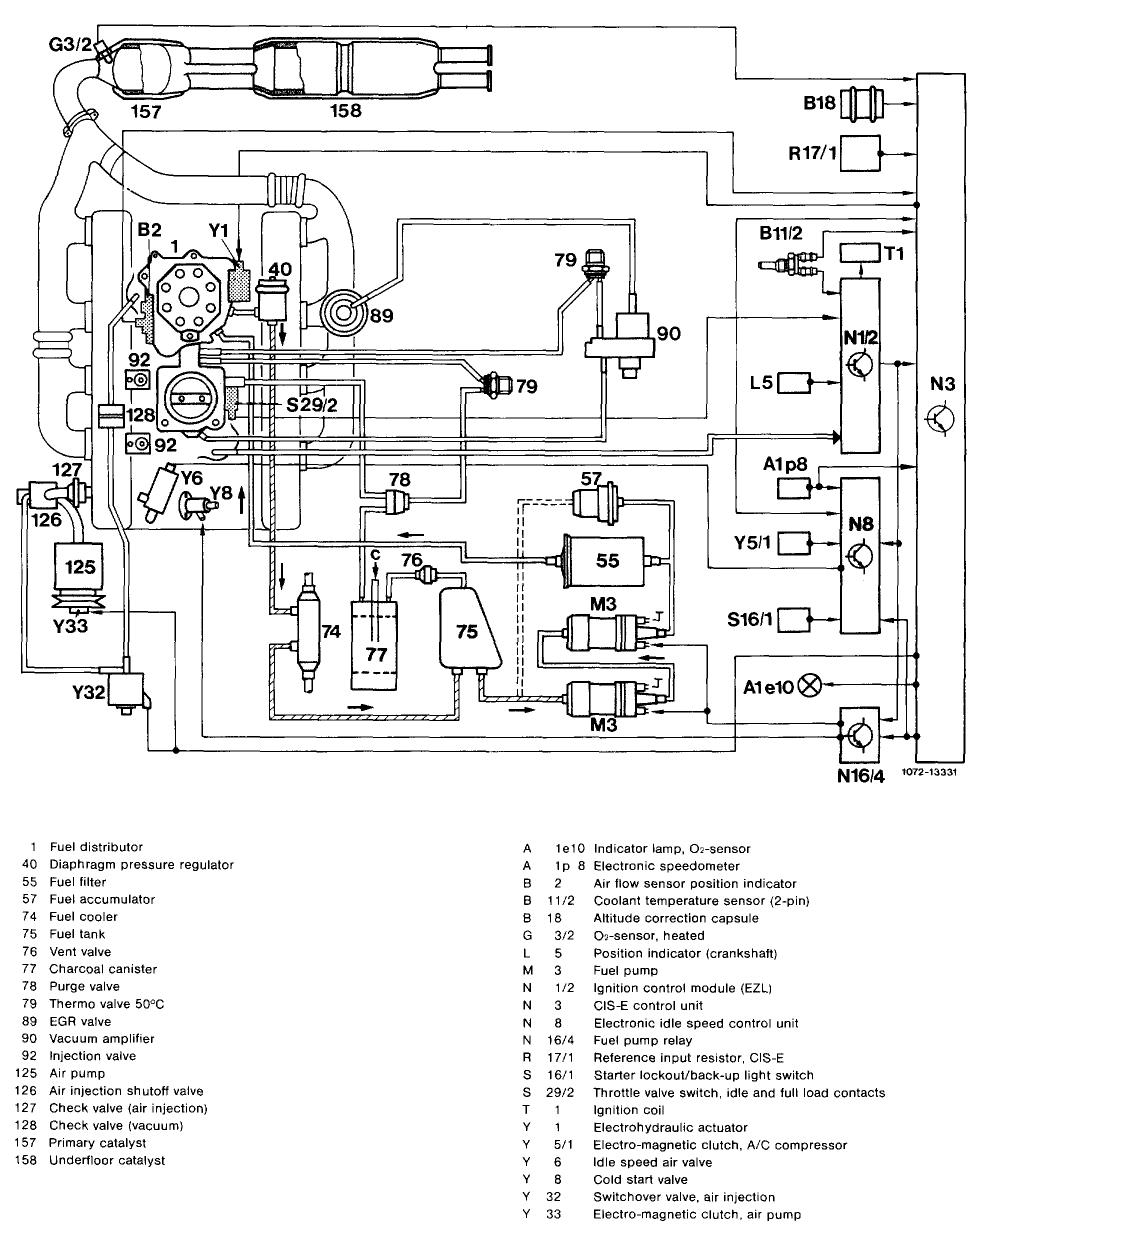 Quadrajet Vacuum Diagram Trusted Wiring Diagrams 1972 Chevelle A C Accumulator Mercedes 420sel Engine Line Wire Data Schema U2022 Routing